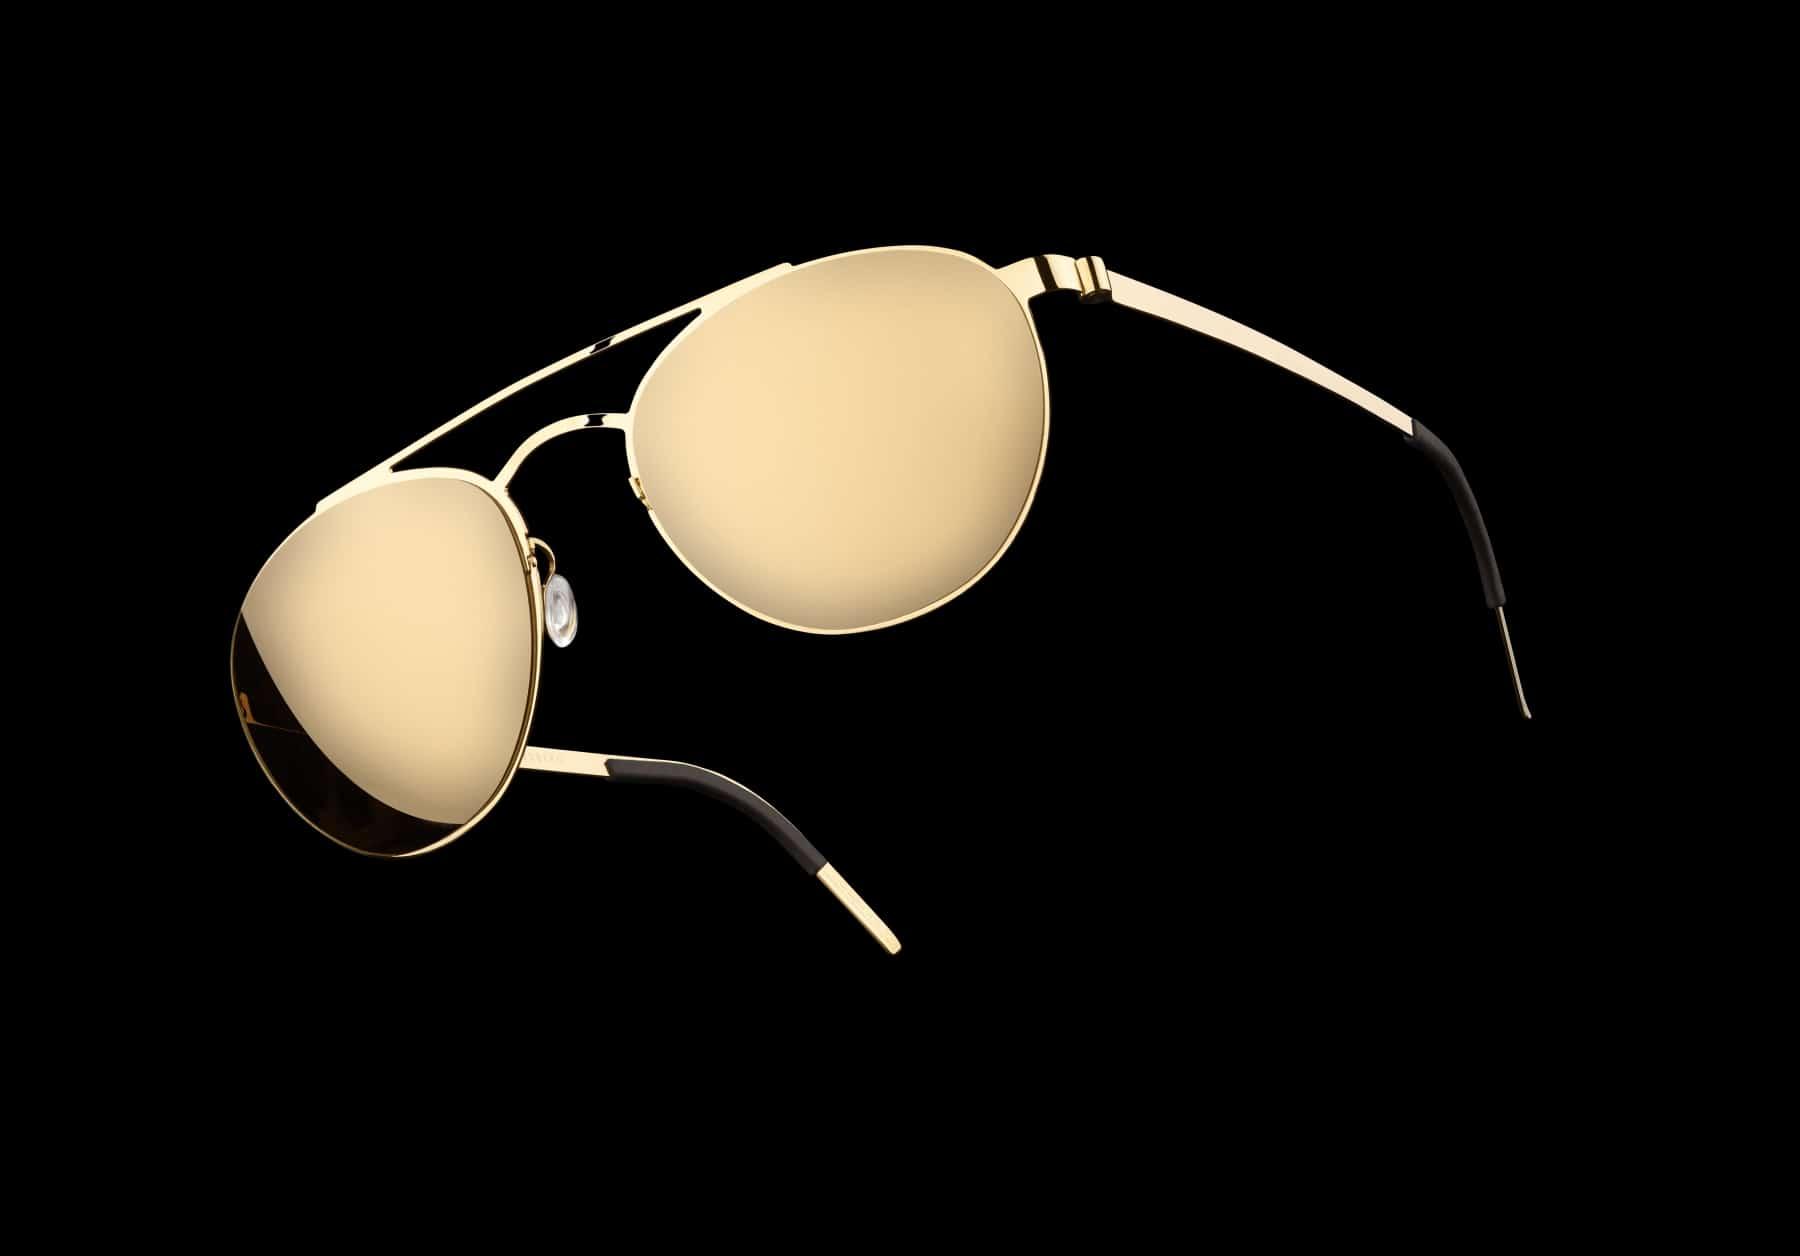 lindberg 5000 solid gold sunglasses front